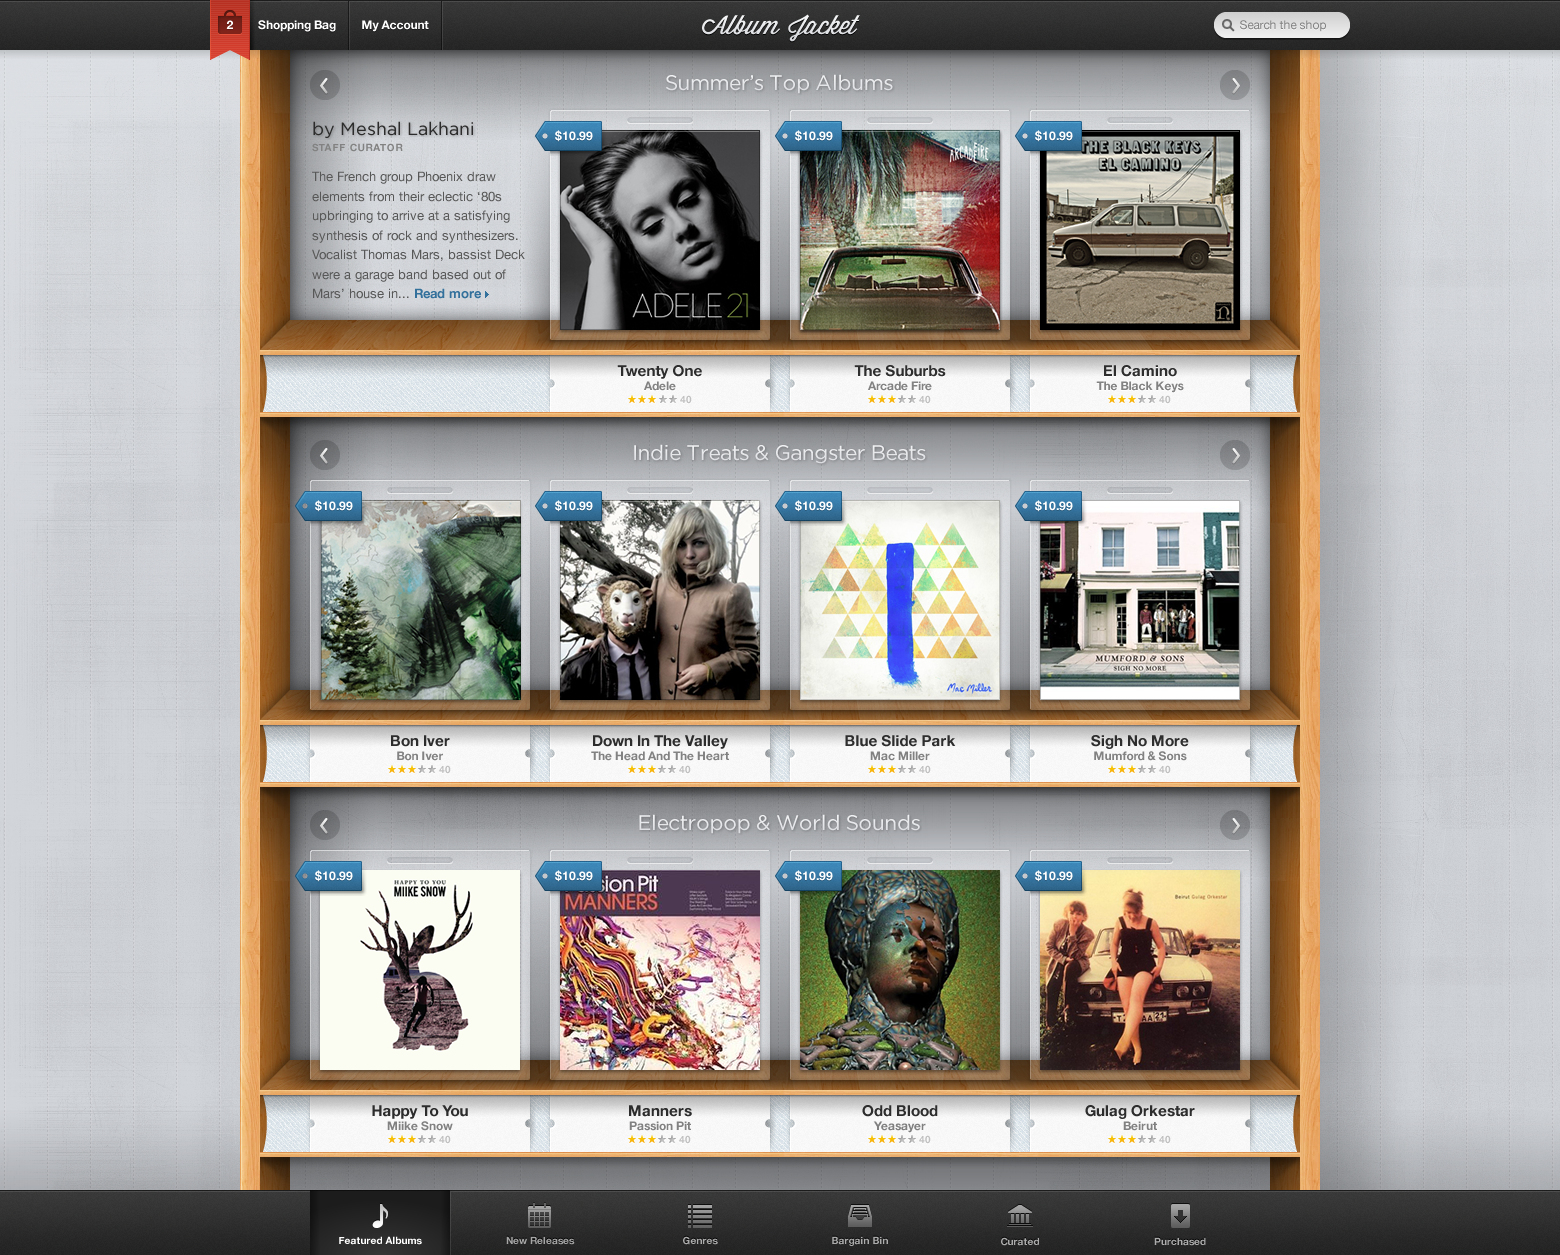 shop-desktop.png by Chris Brauckmuller